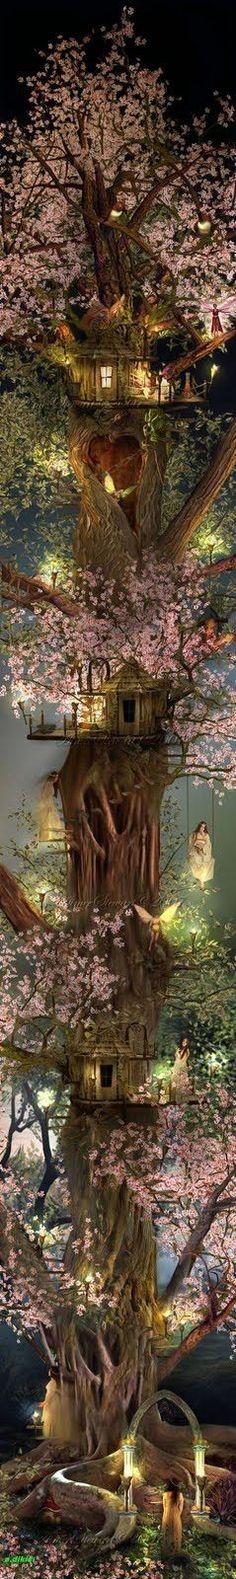 Enchanted Tree: